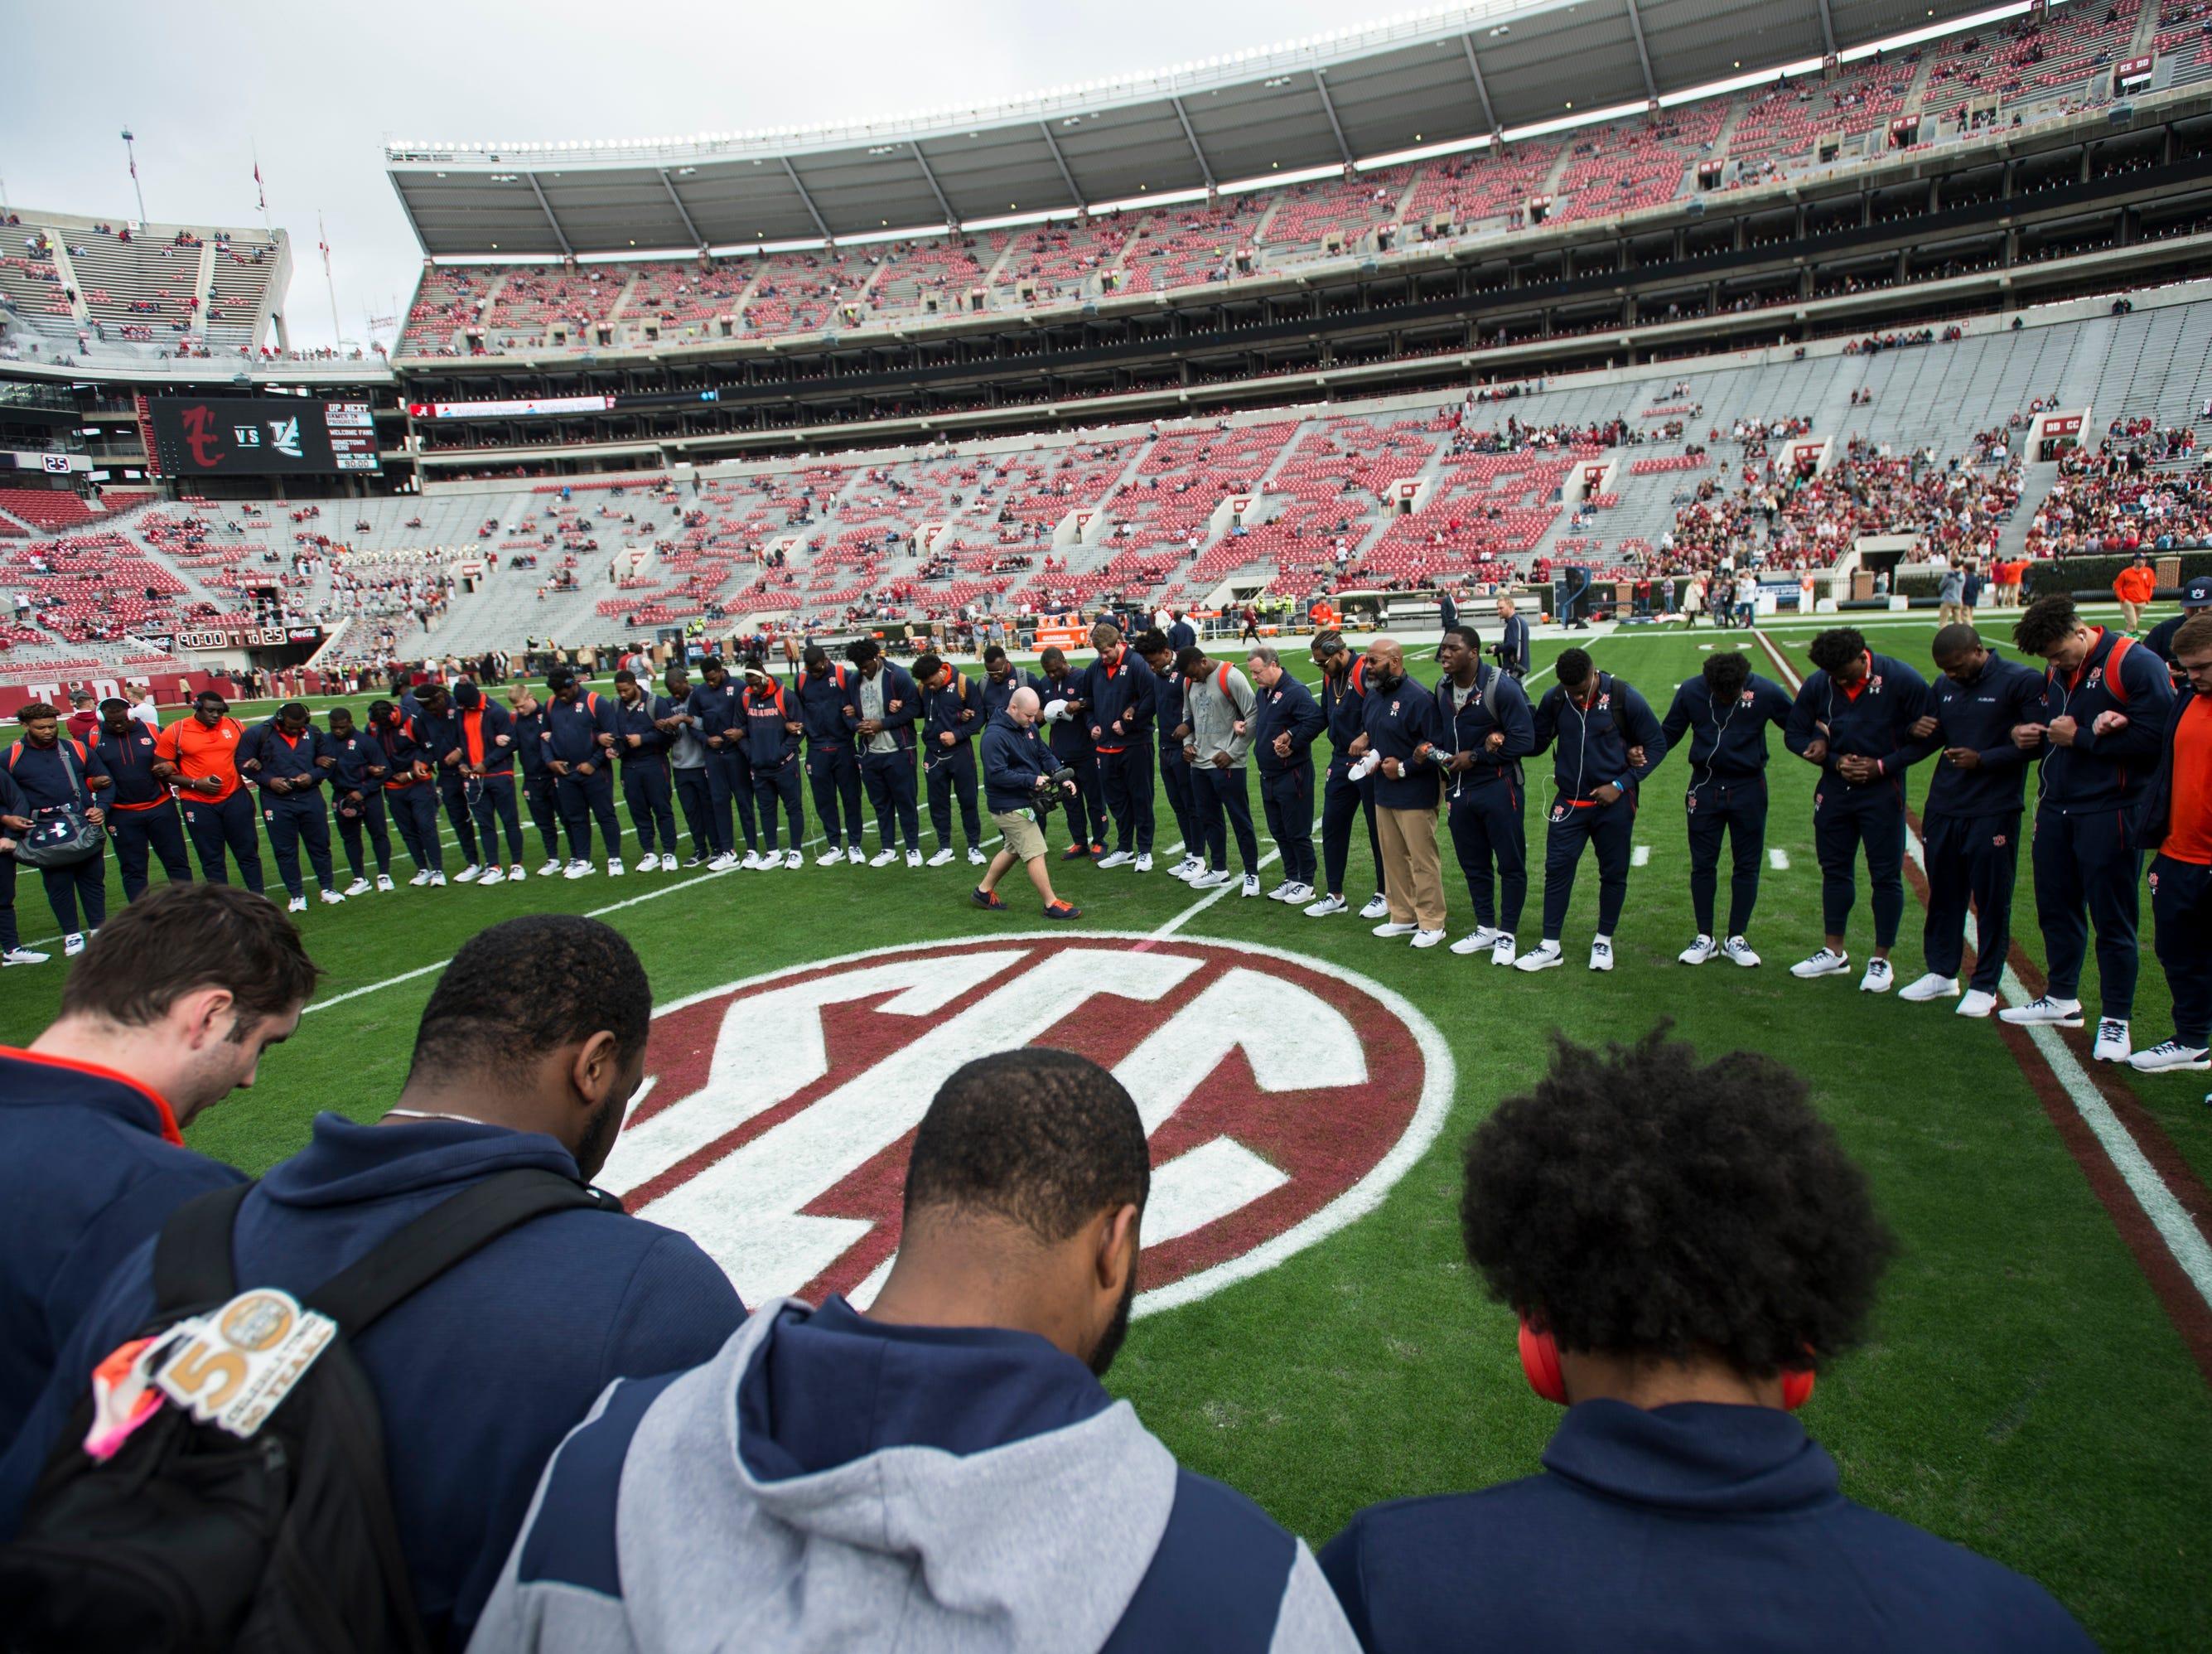 Auburn players huddle for a pregame prayer at Bryant-Denny Stadium in Tuscaloosa, Ala., on Saturday, Nov. 24, 2018.